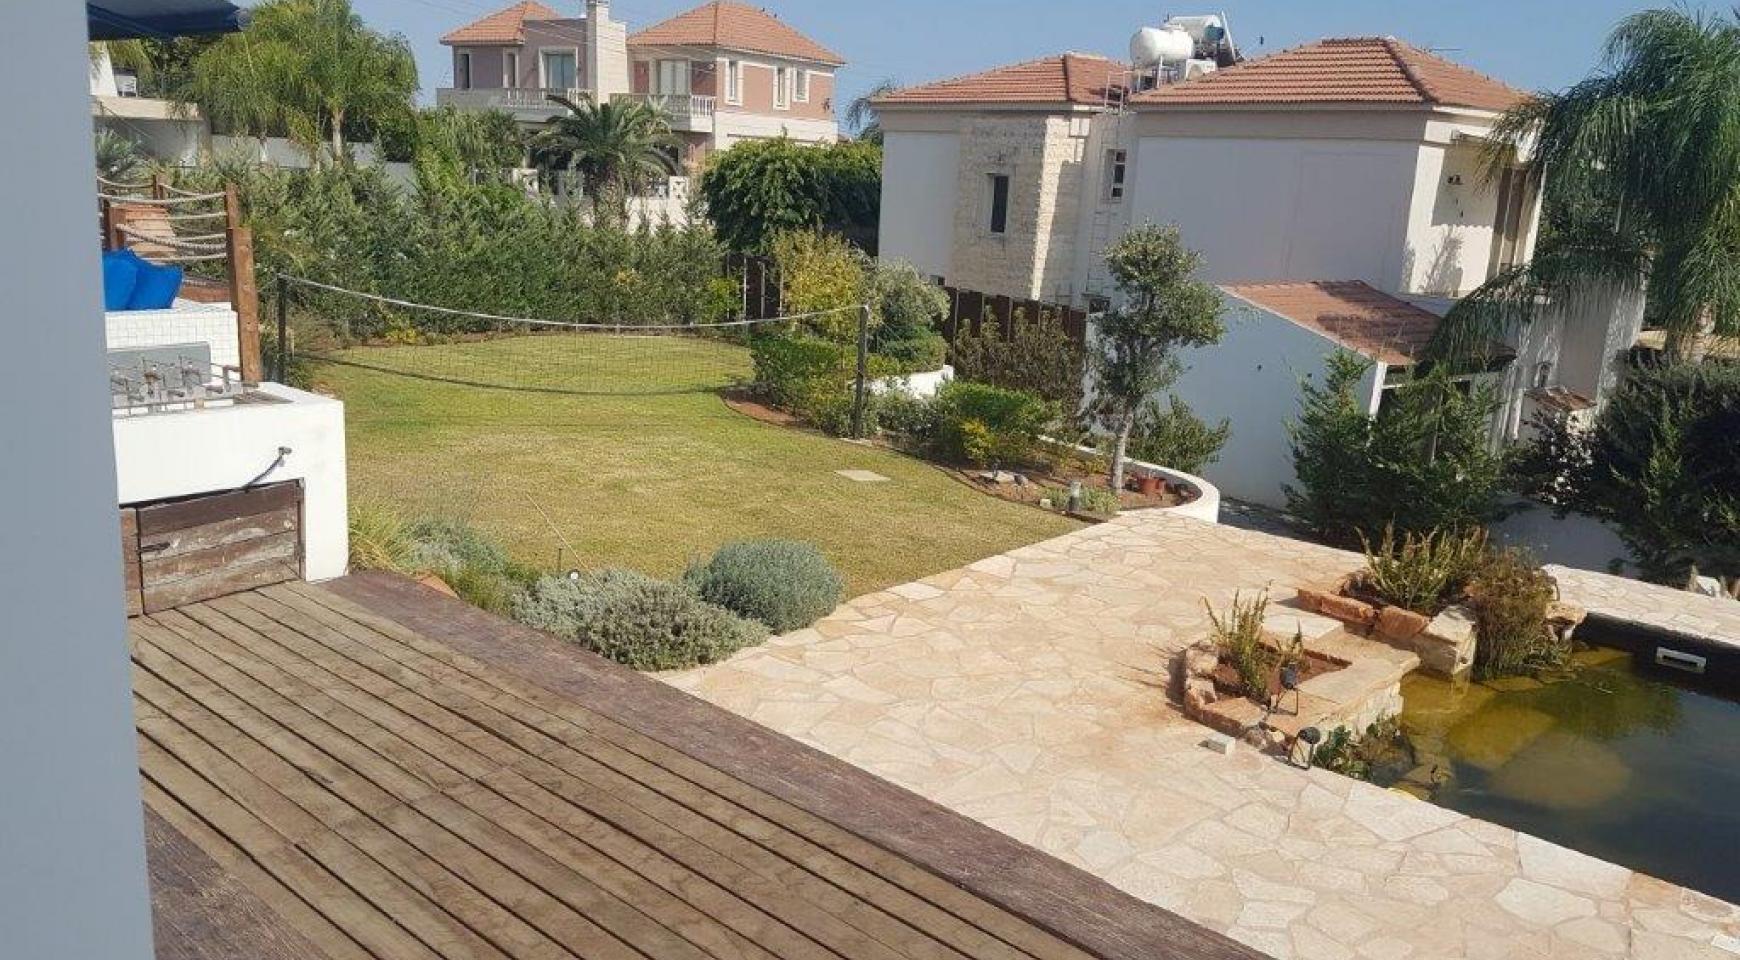 5-Спальная Вилла с видом на Море в районе  Agios Tychonas - 2